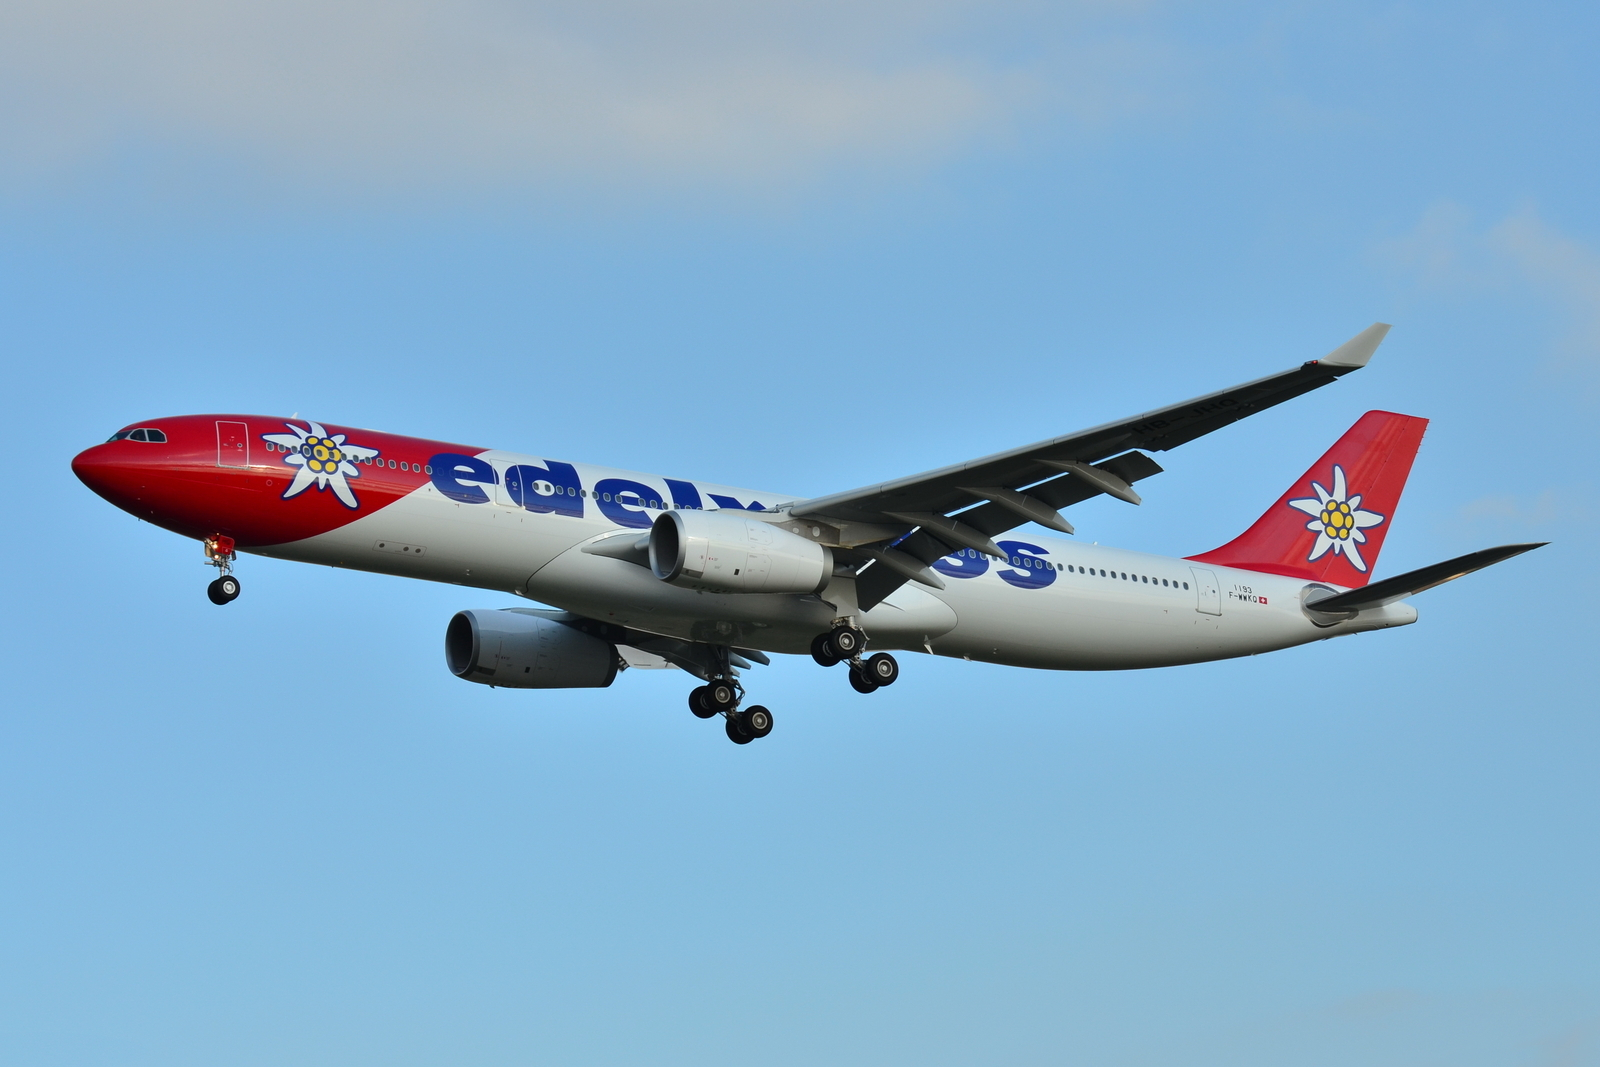 File:Airbus A330-300 Edelweiss Air (EDW) F-WWKQ - MSN